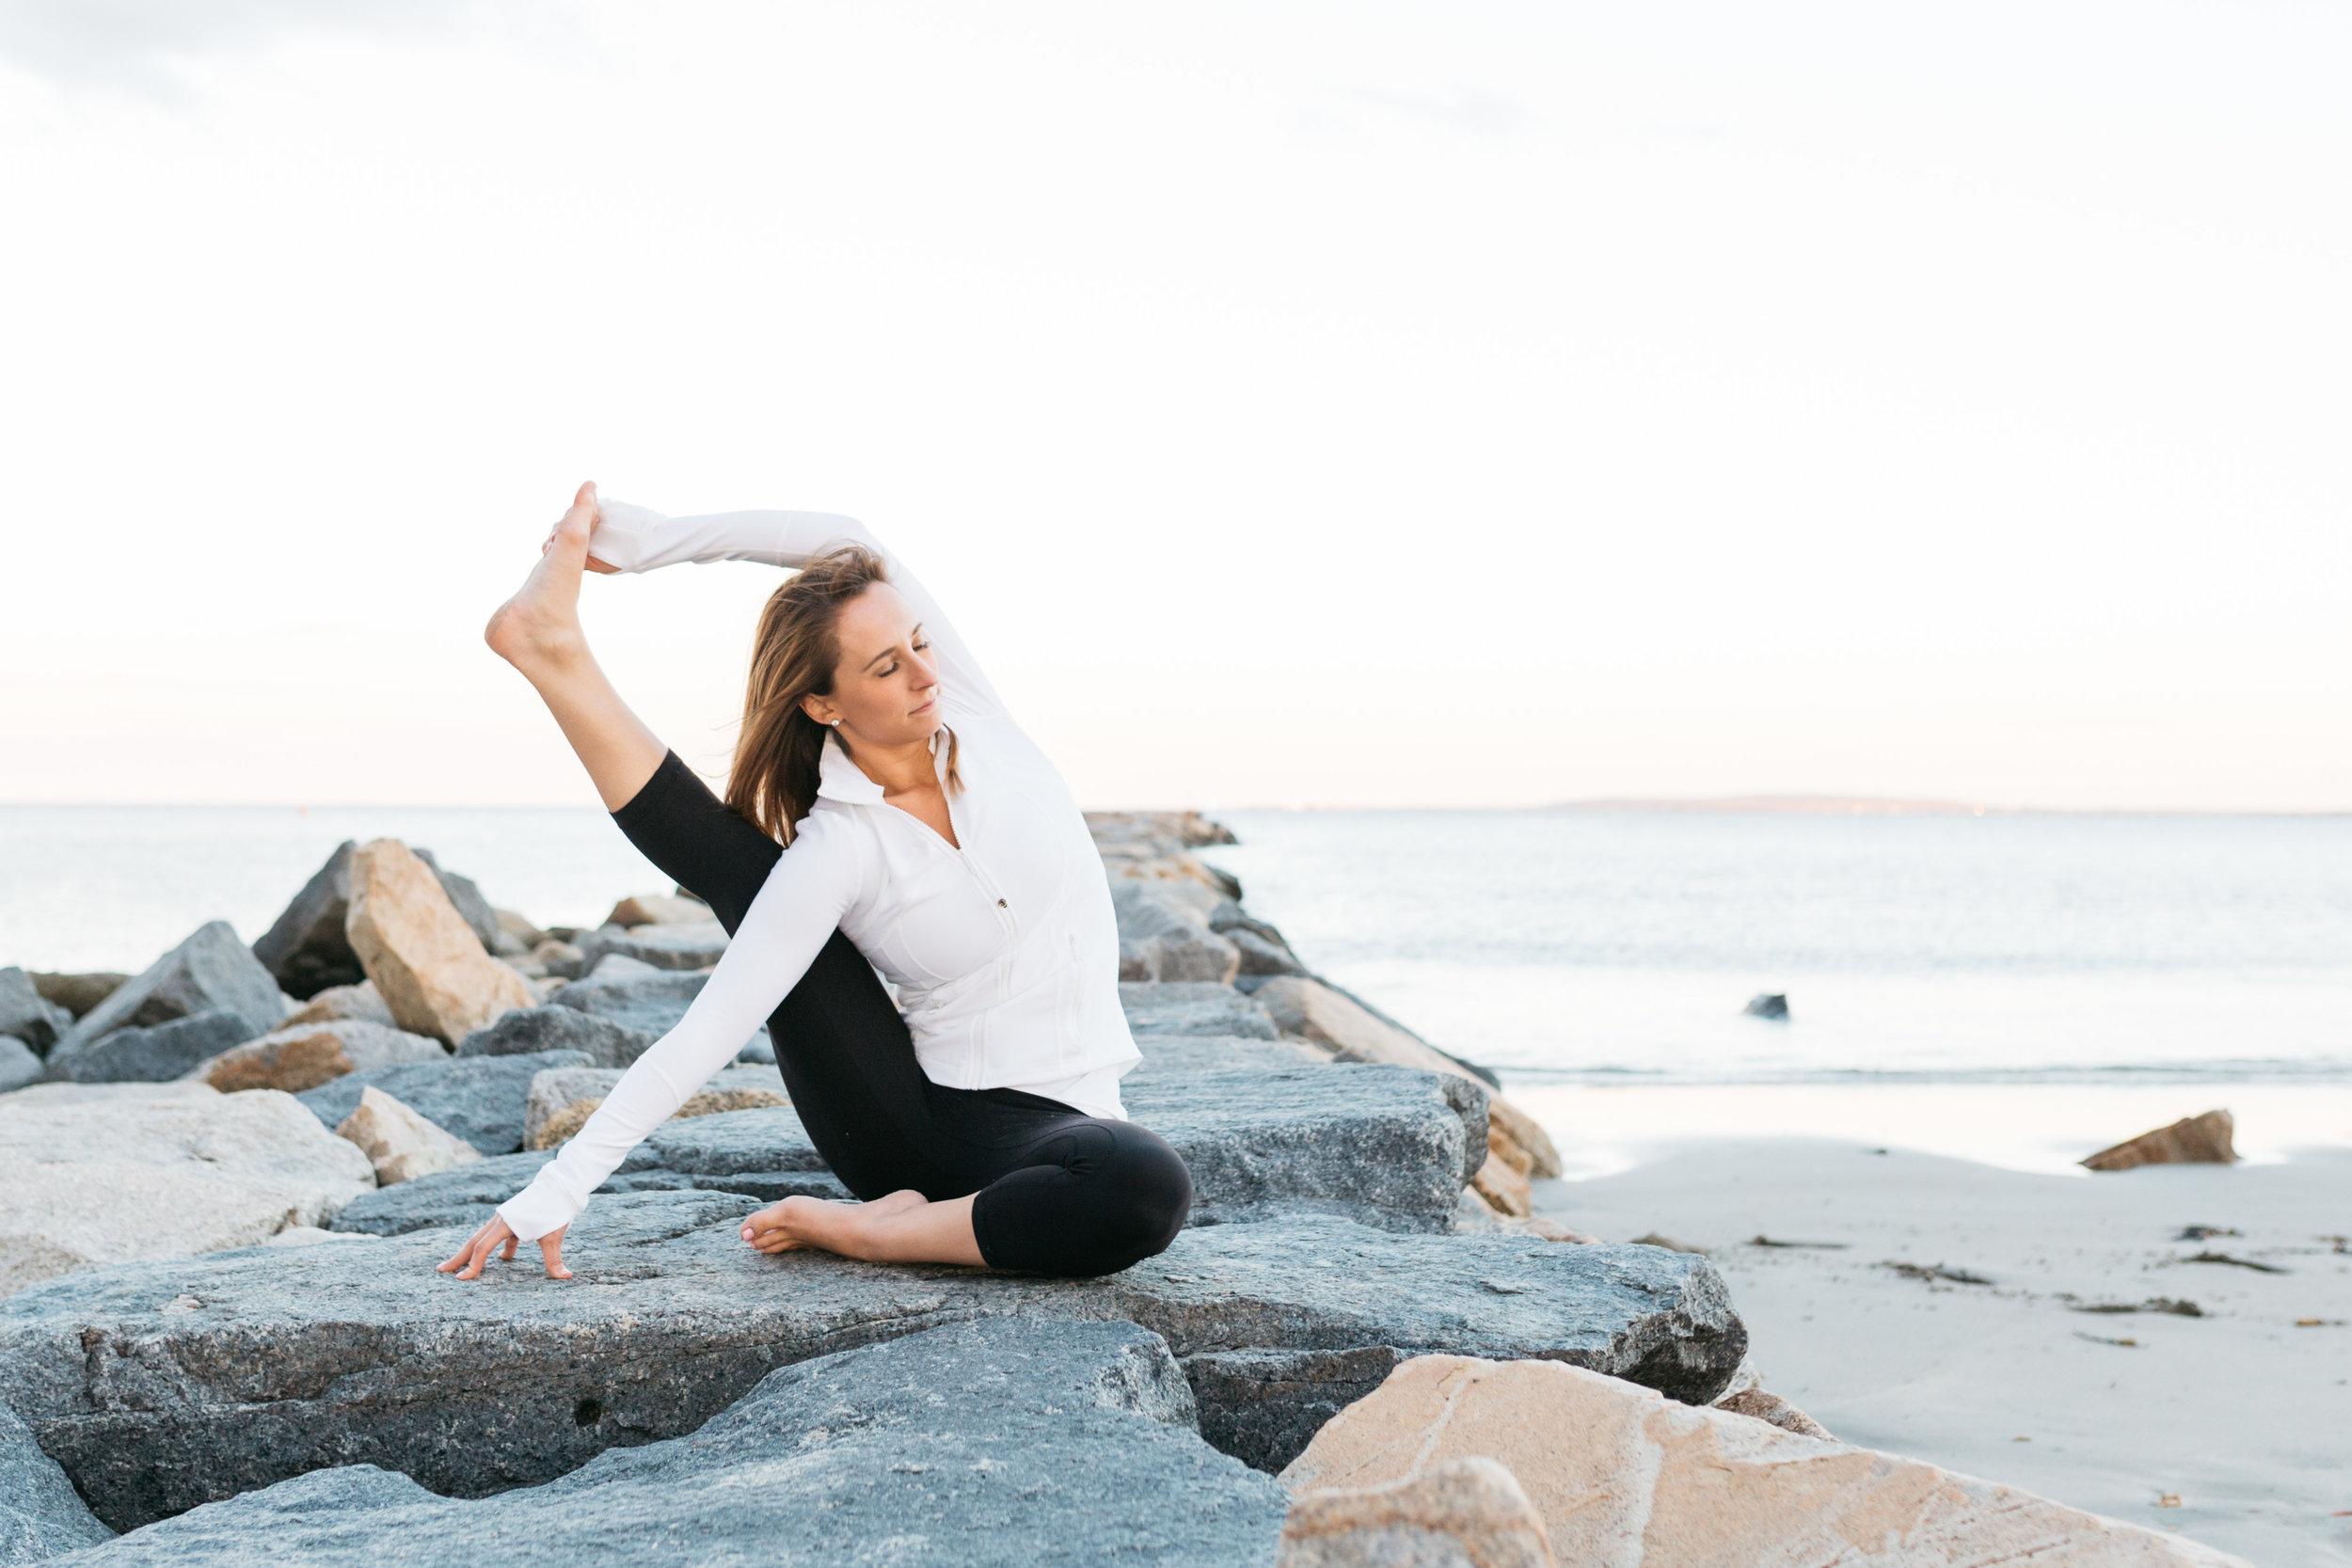 boston-yoga-photographer-kerry-17.jpg